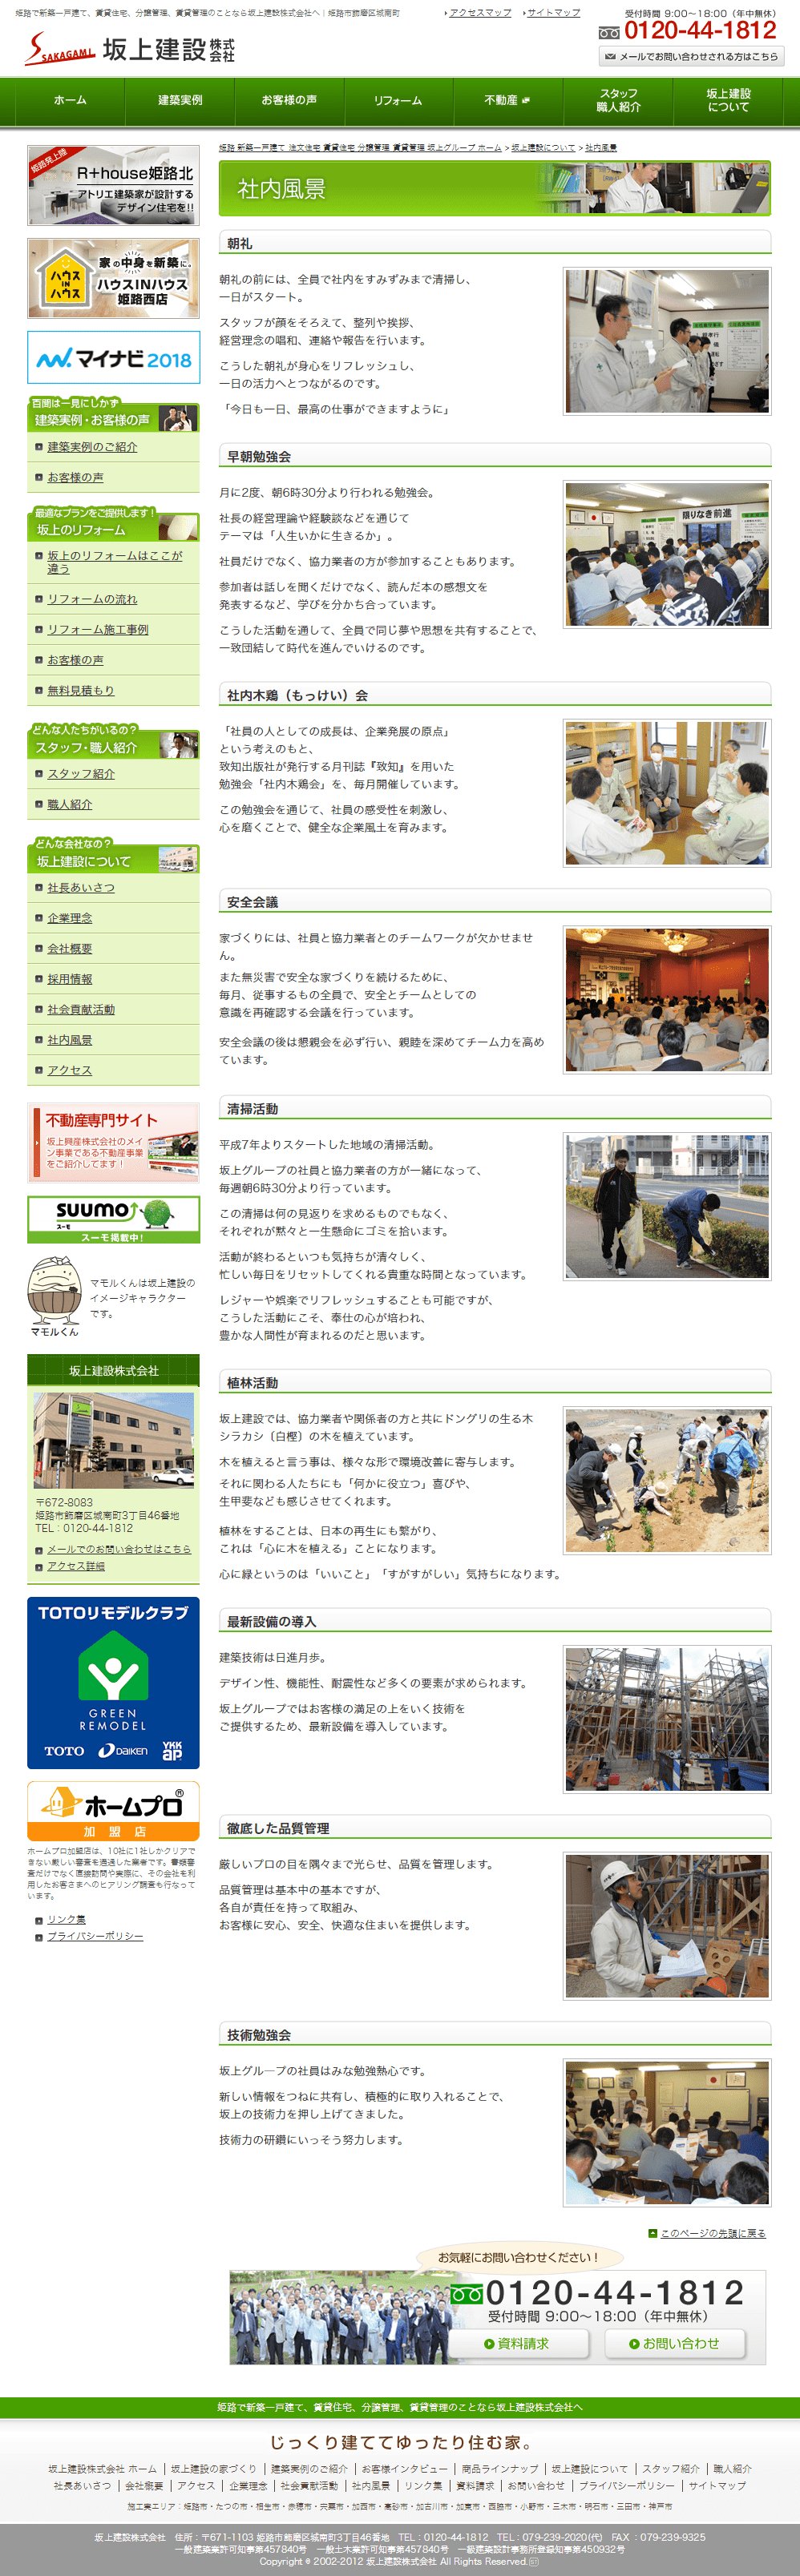 姫路市 坂上建設株式会社様 ホームページ制作2